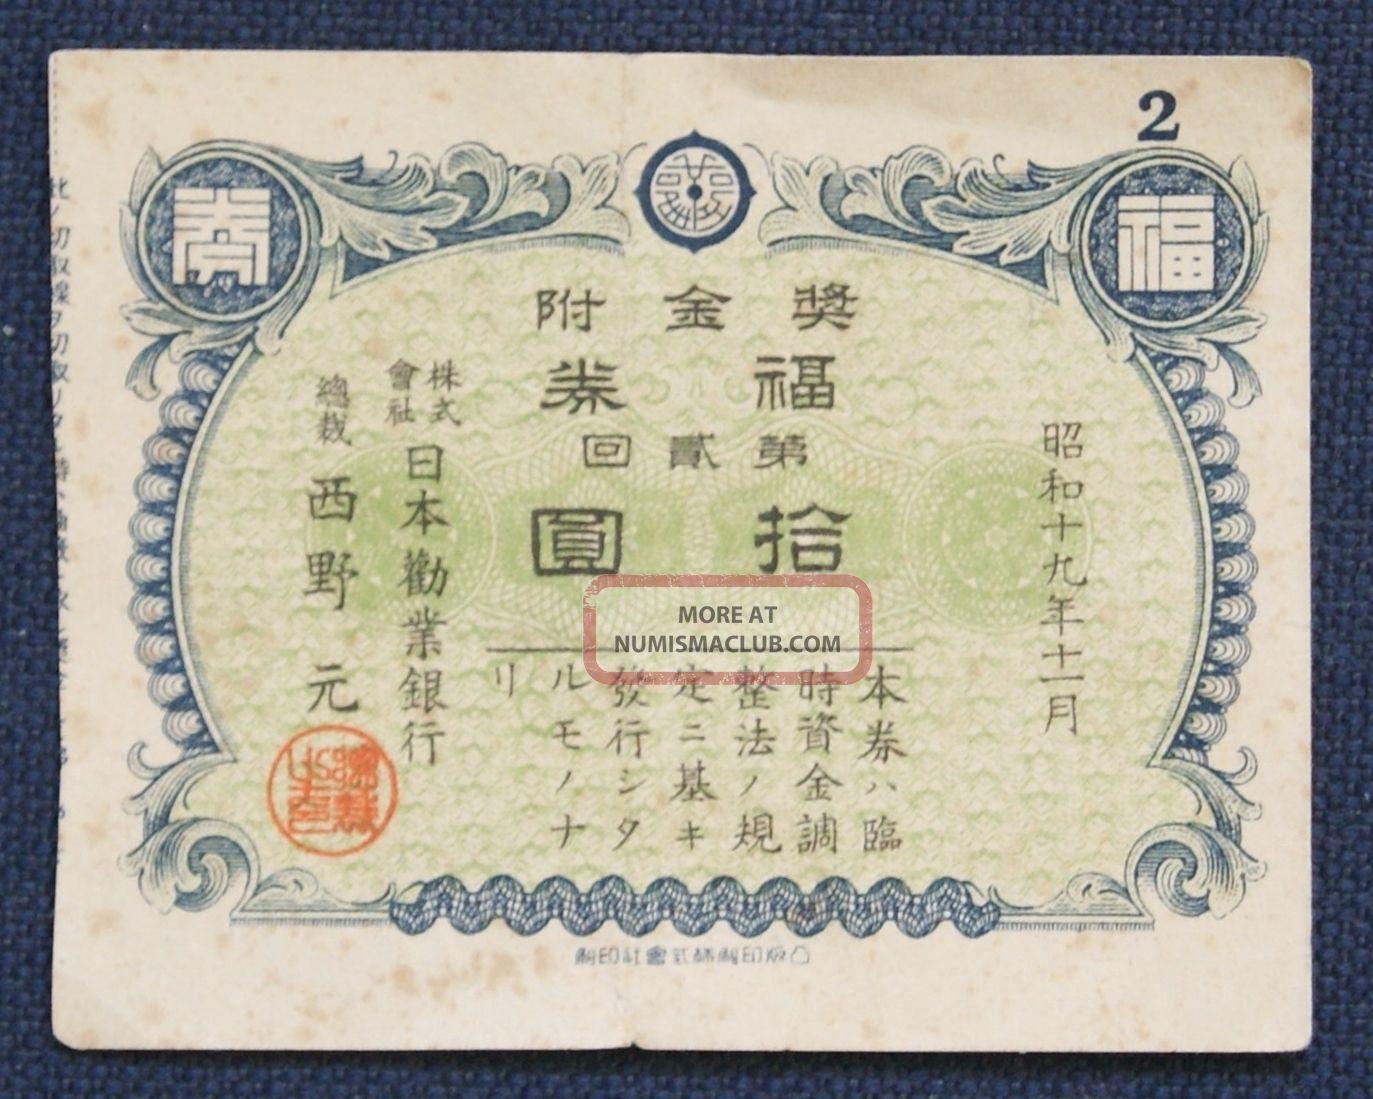 Wwii 1944 Japan Kangyo Bank Savings Bond 10 Dollar Bonus Redeem Certificate Stocks & Bonds, Scripophily photo